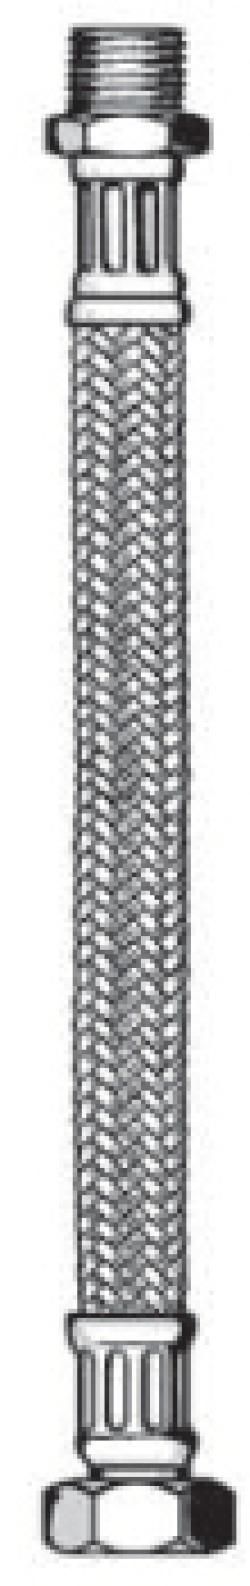 МЕ 5615.1104.40 Meiflex Dn13, 1/2 BPx1/2 HP, 400mm